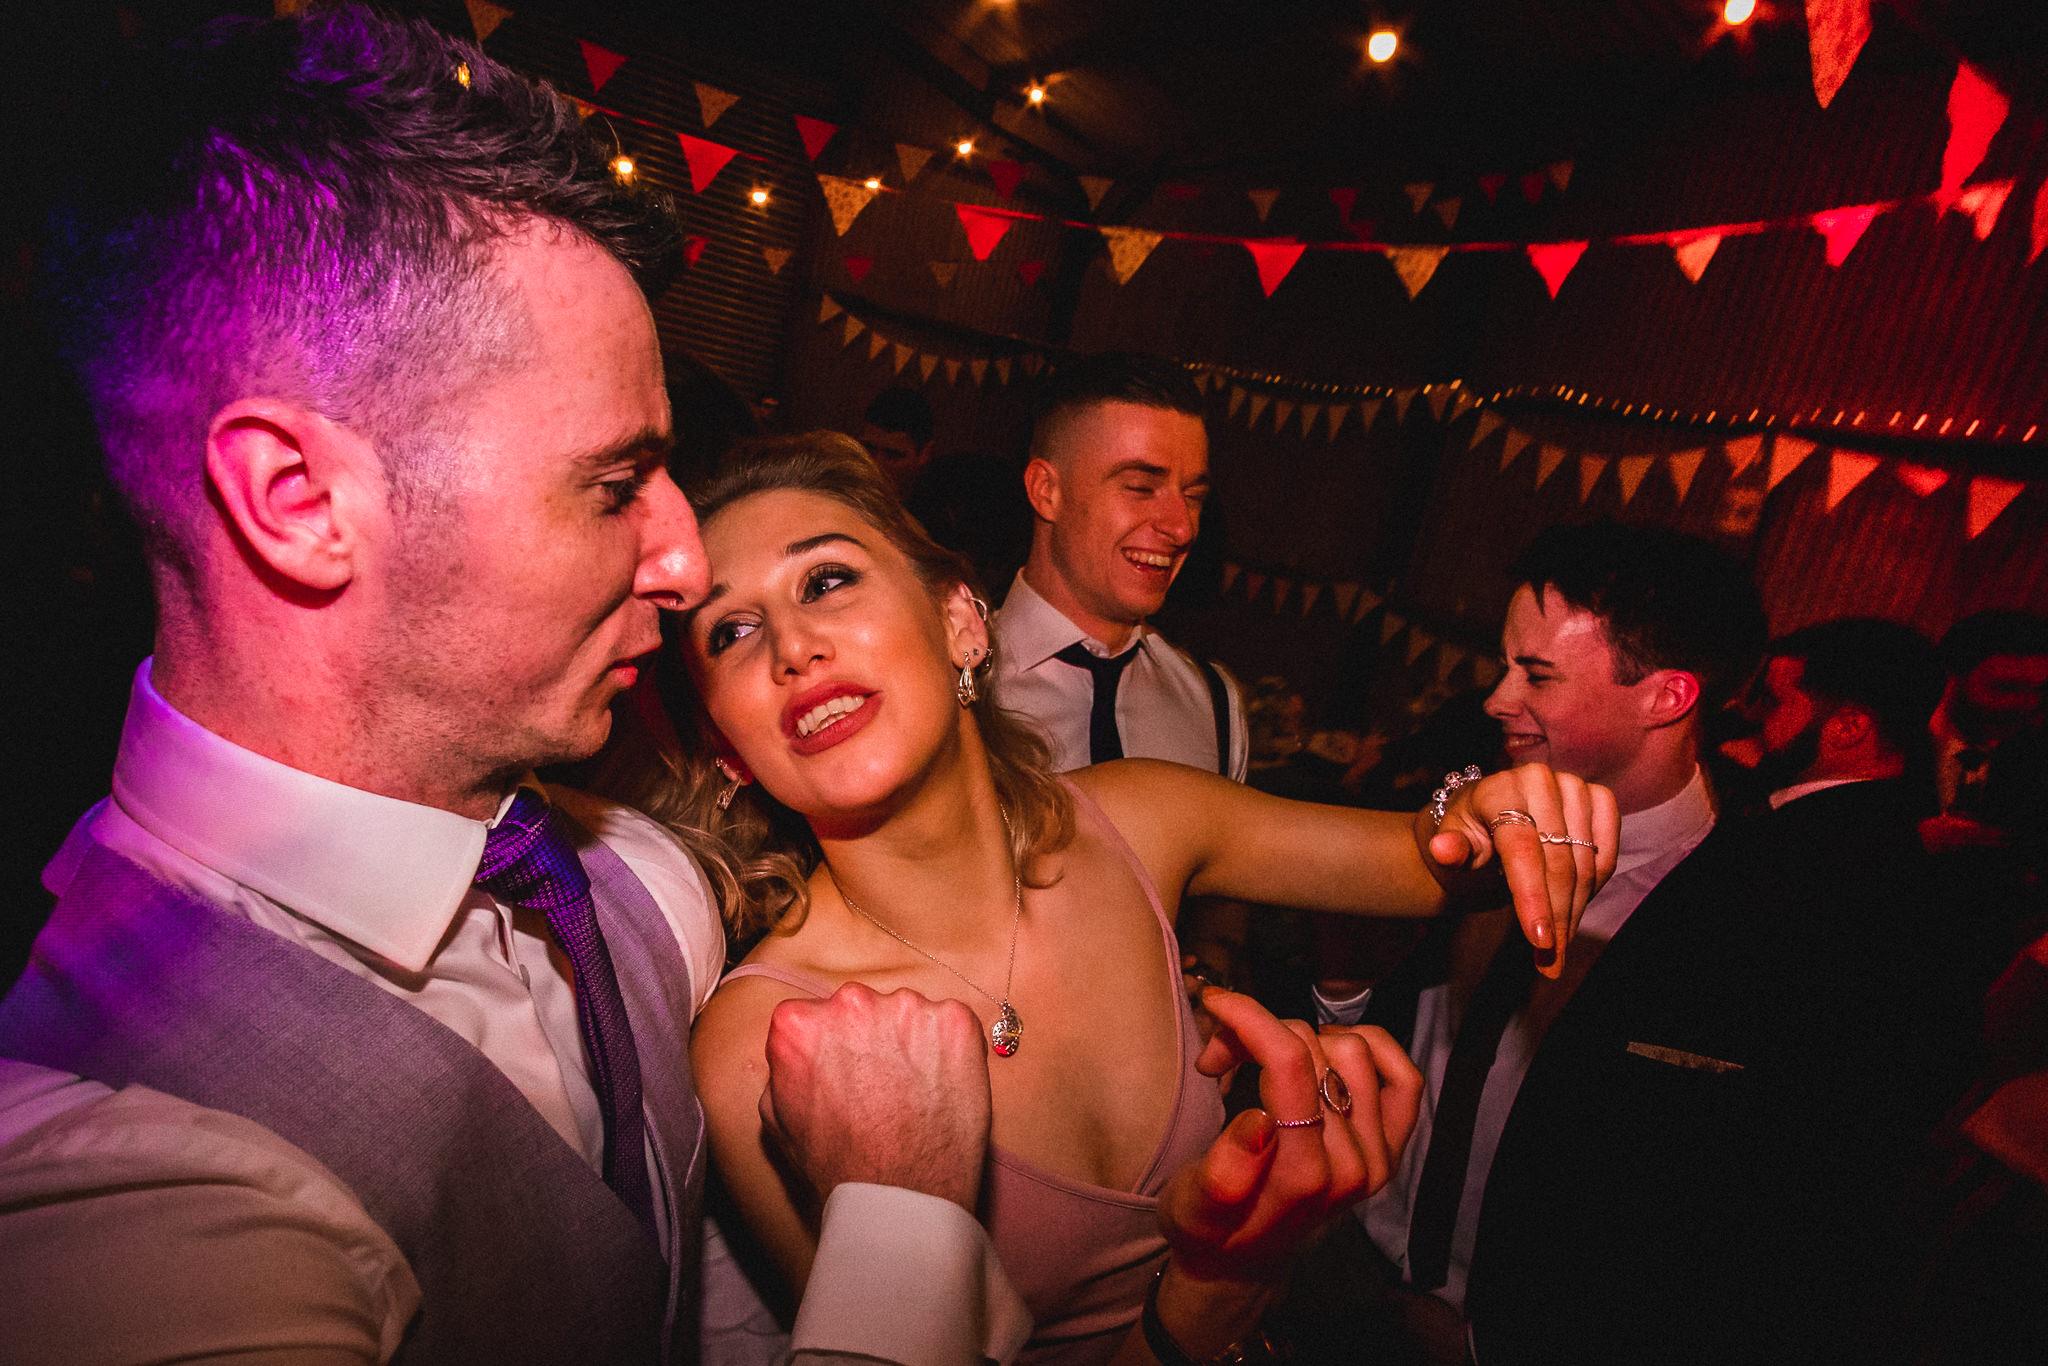 Crazy party animals dancing at wedding after reception at Berts Barrow Farm